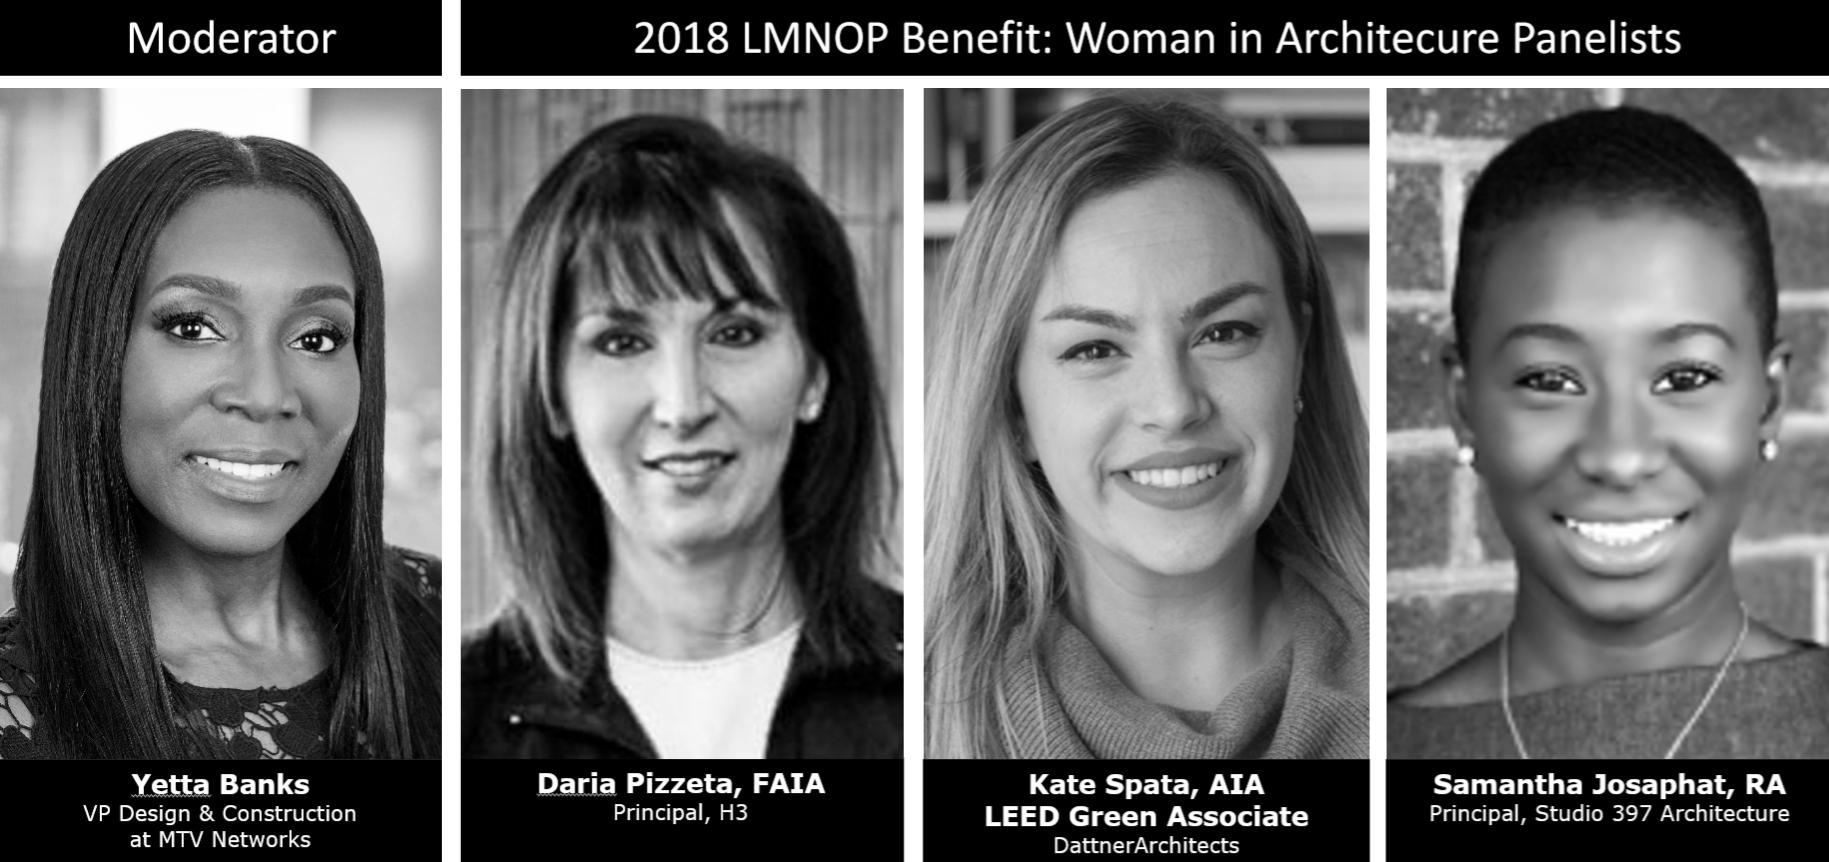 2018 LMNOP Benefit - Woman in Architecture (1).jpg